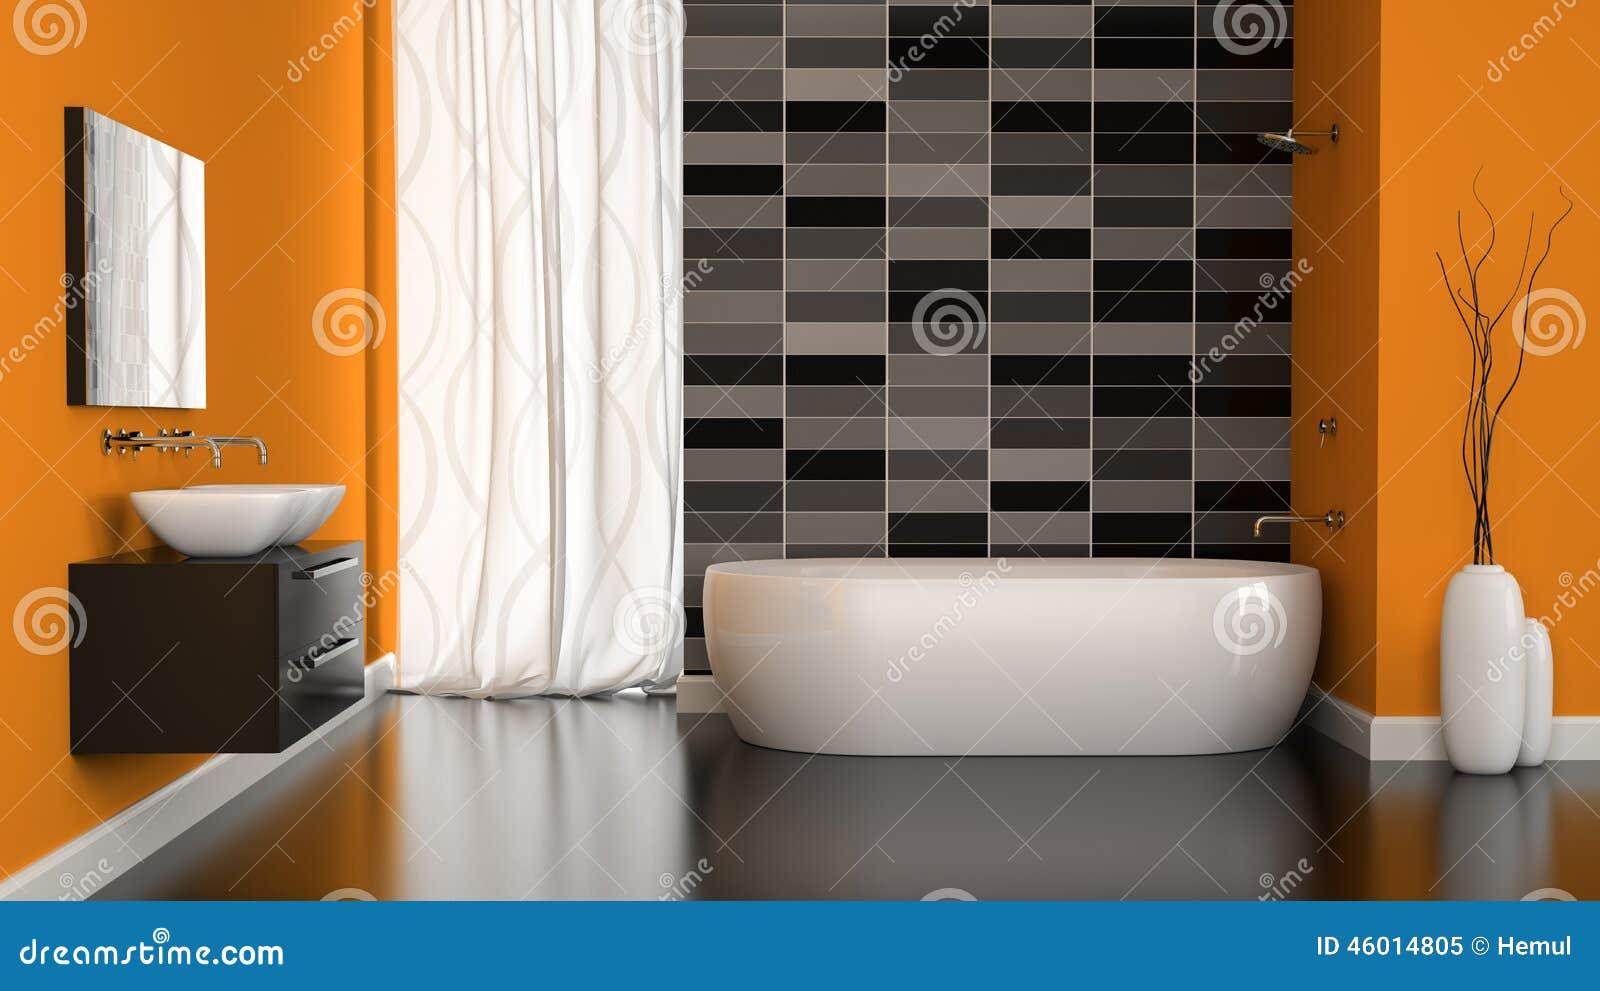 Interior of modern bathroom with orange wall stock for Salle de bain moderne orange